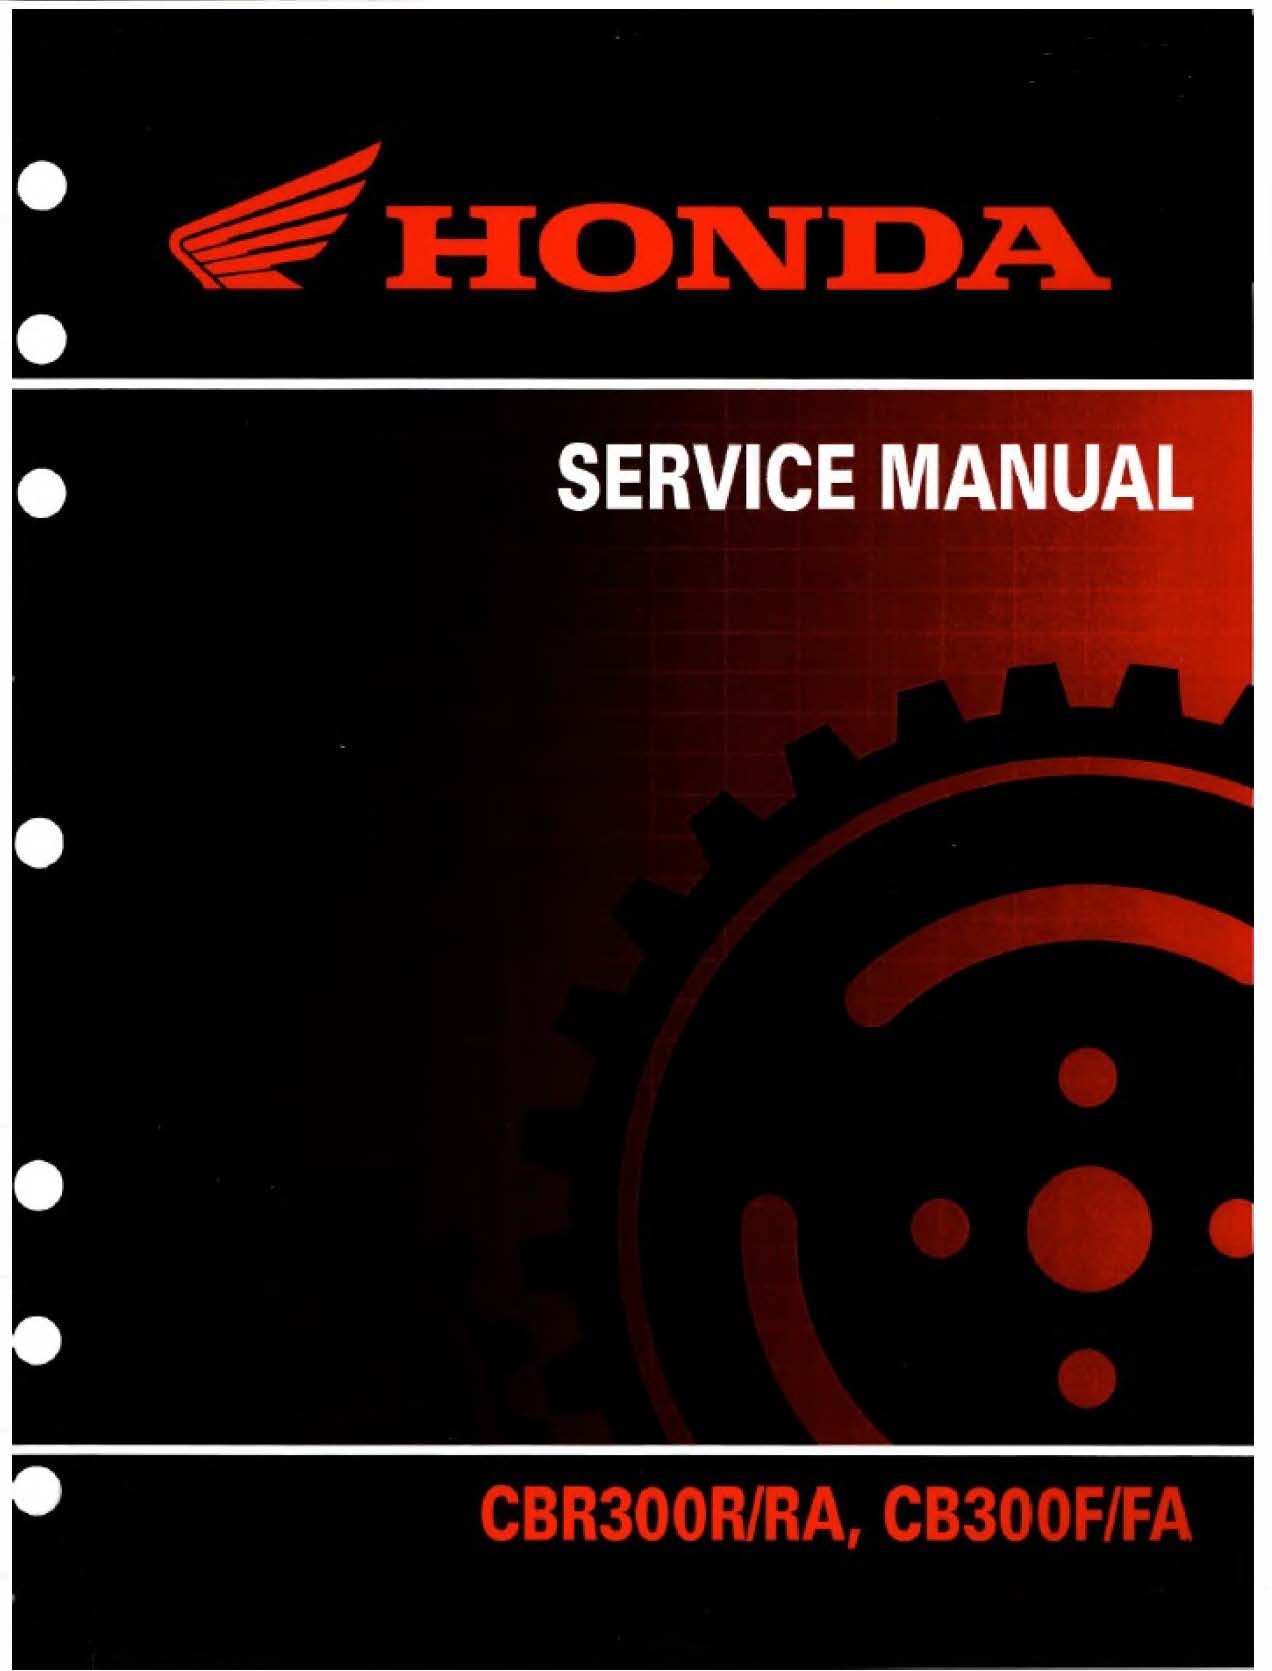 Workshop manual for Honda CBR300R/RA